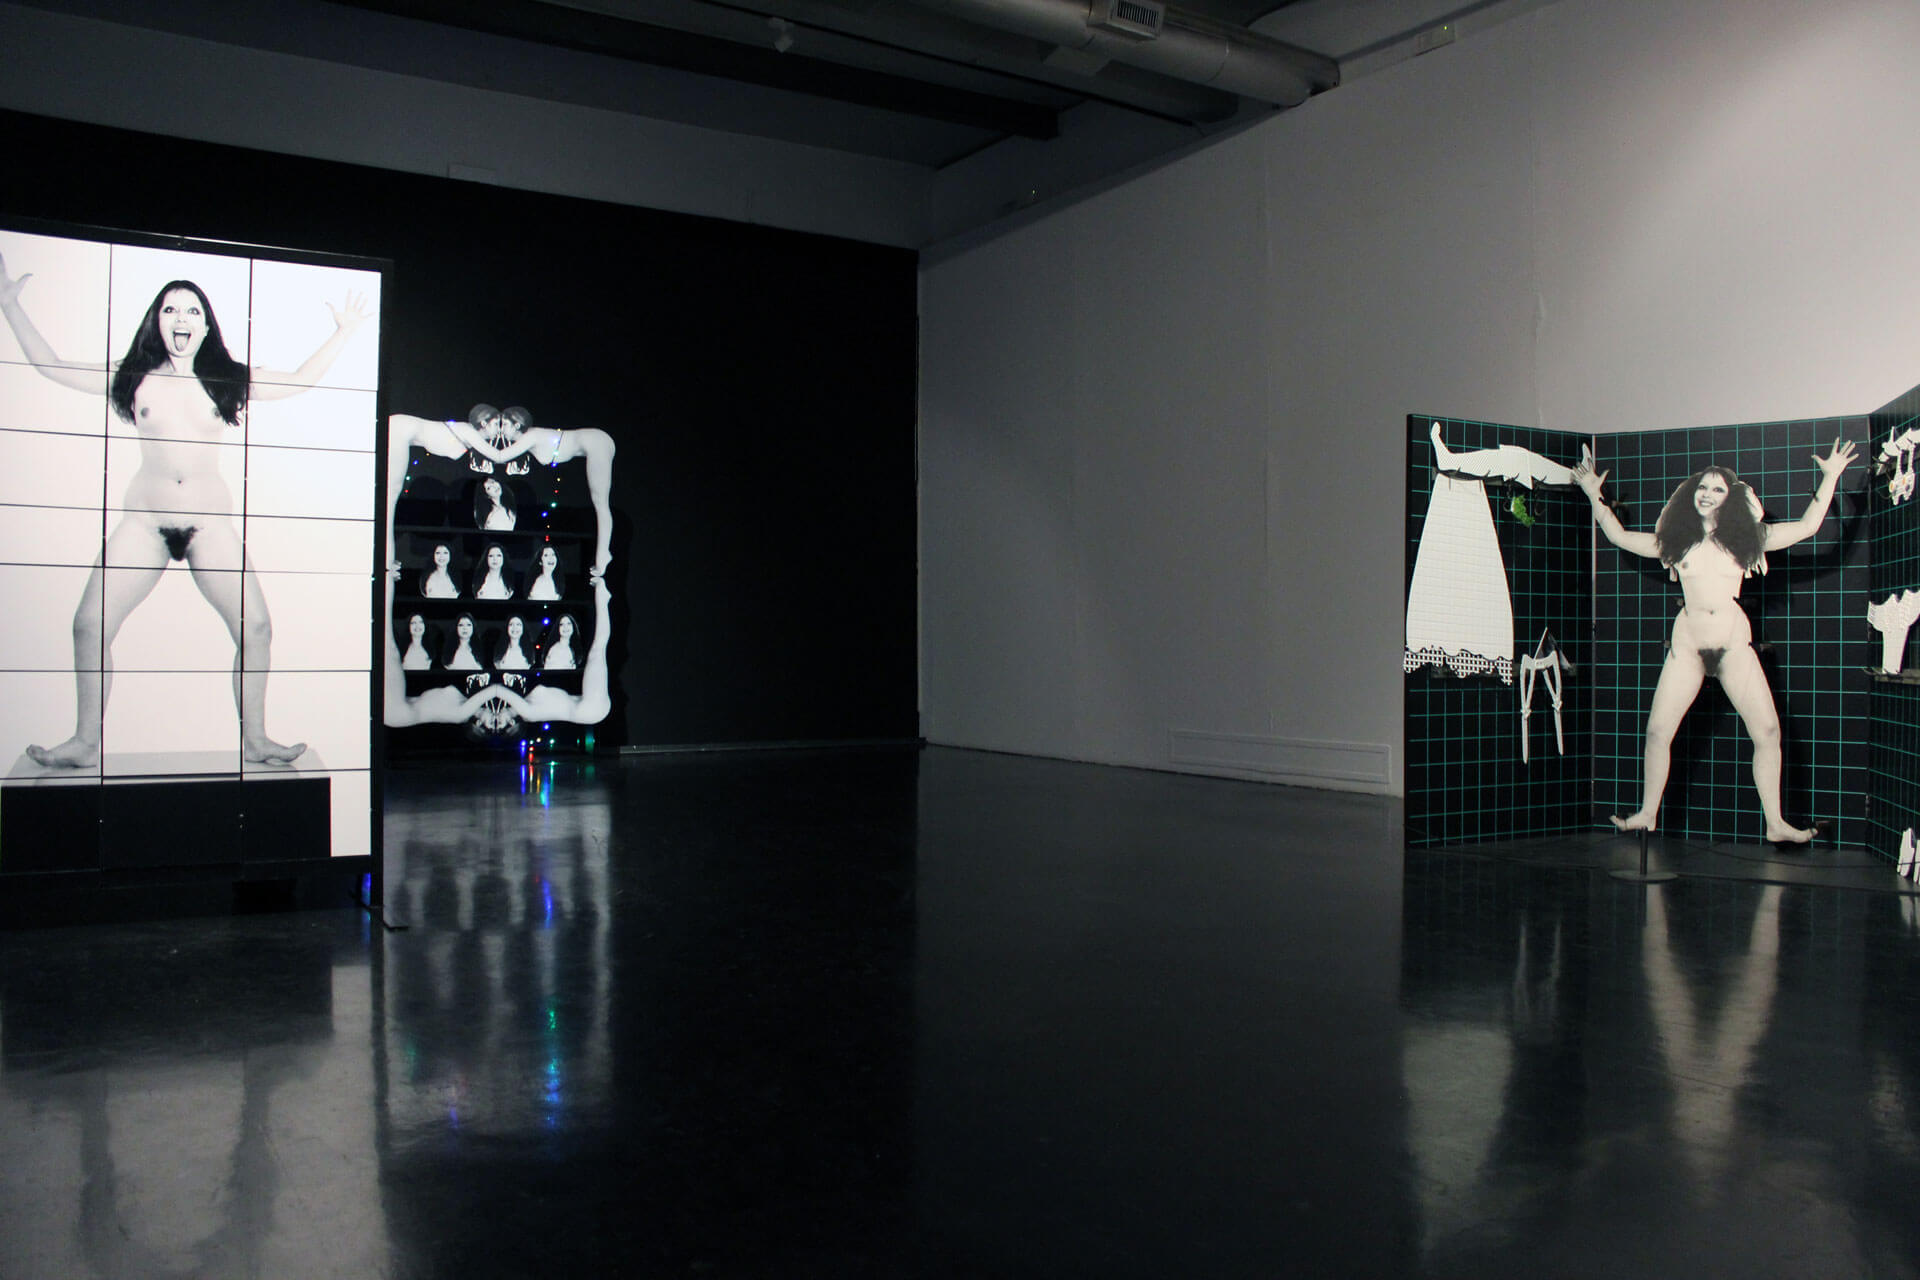 ORLAN, VideORLAN - Technobody, 2017, exhibition at MACRO